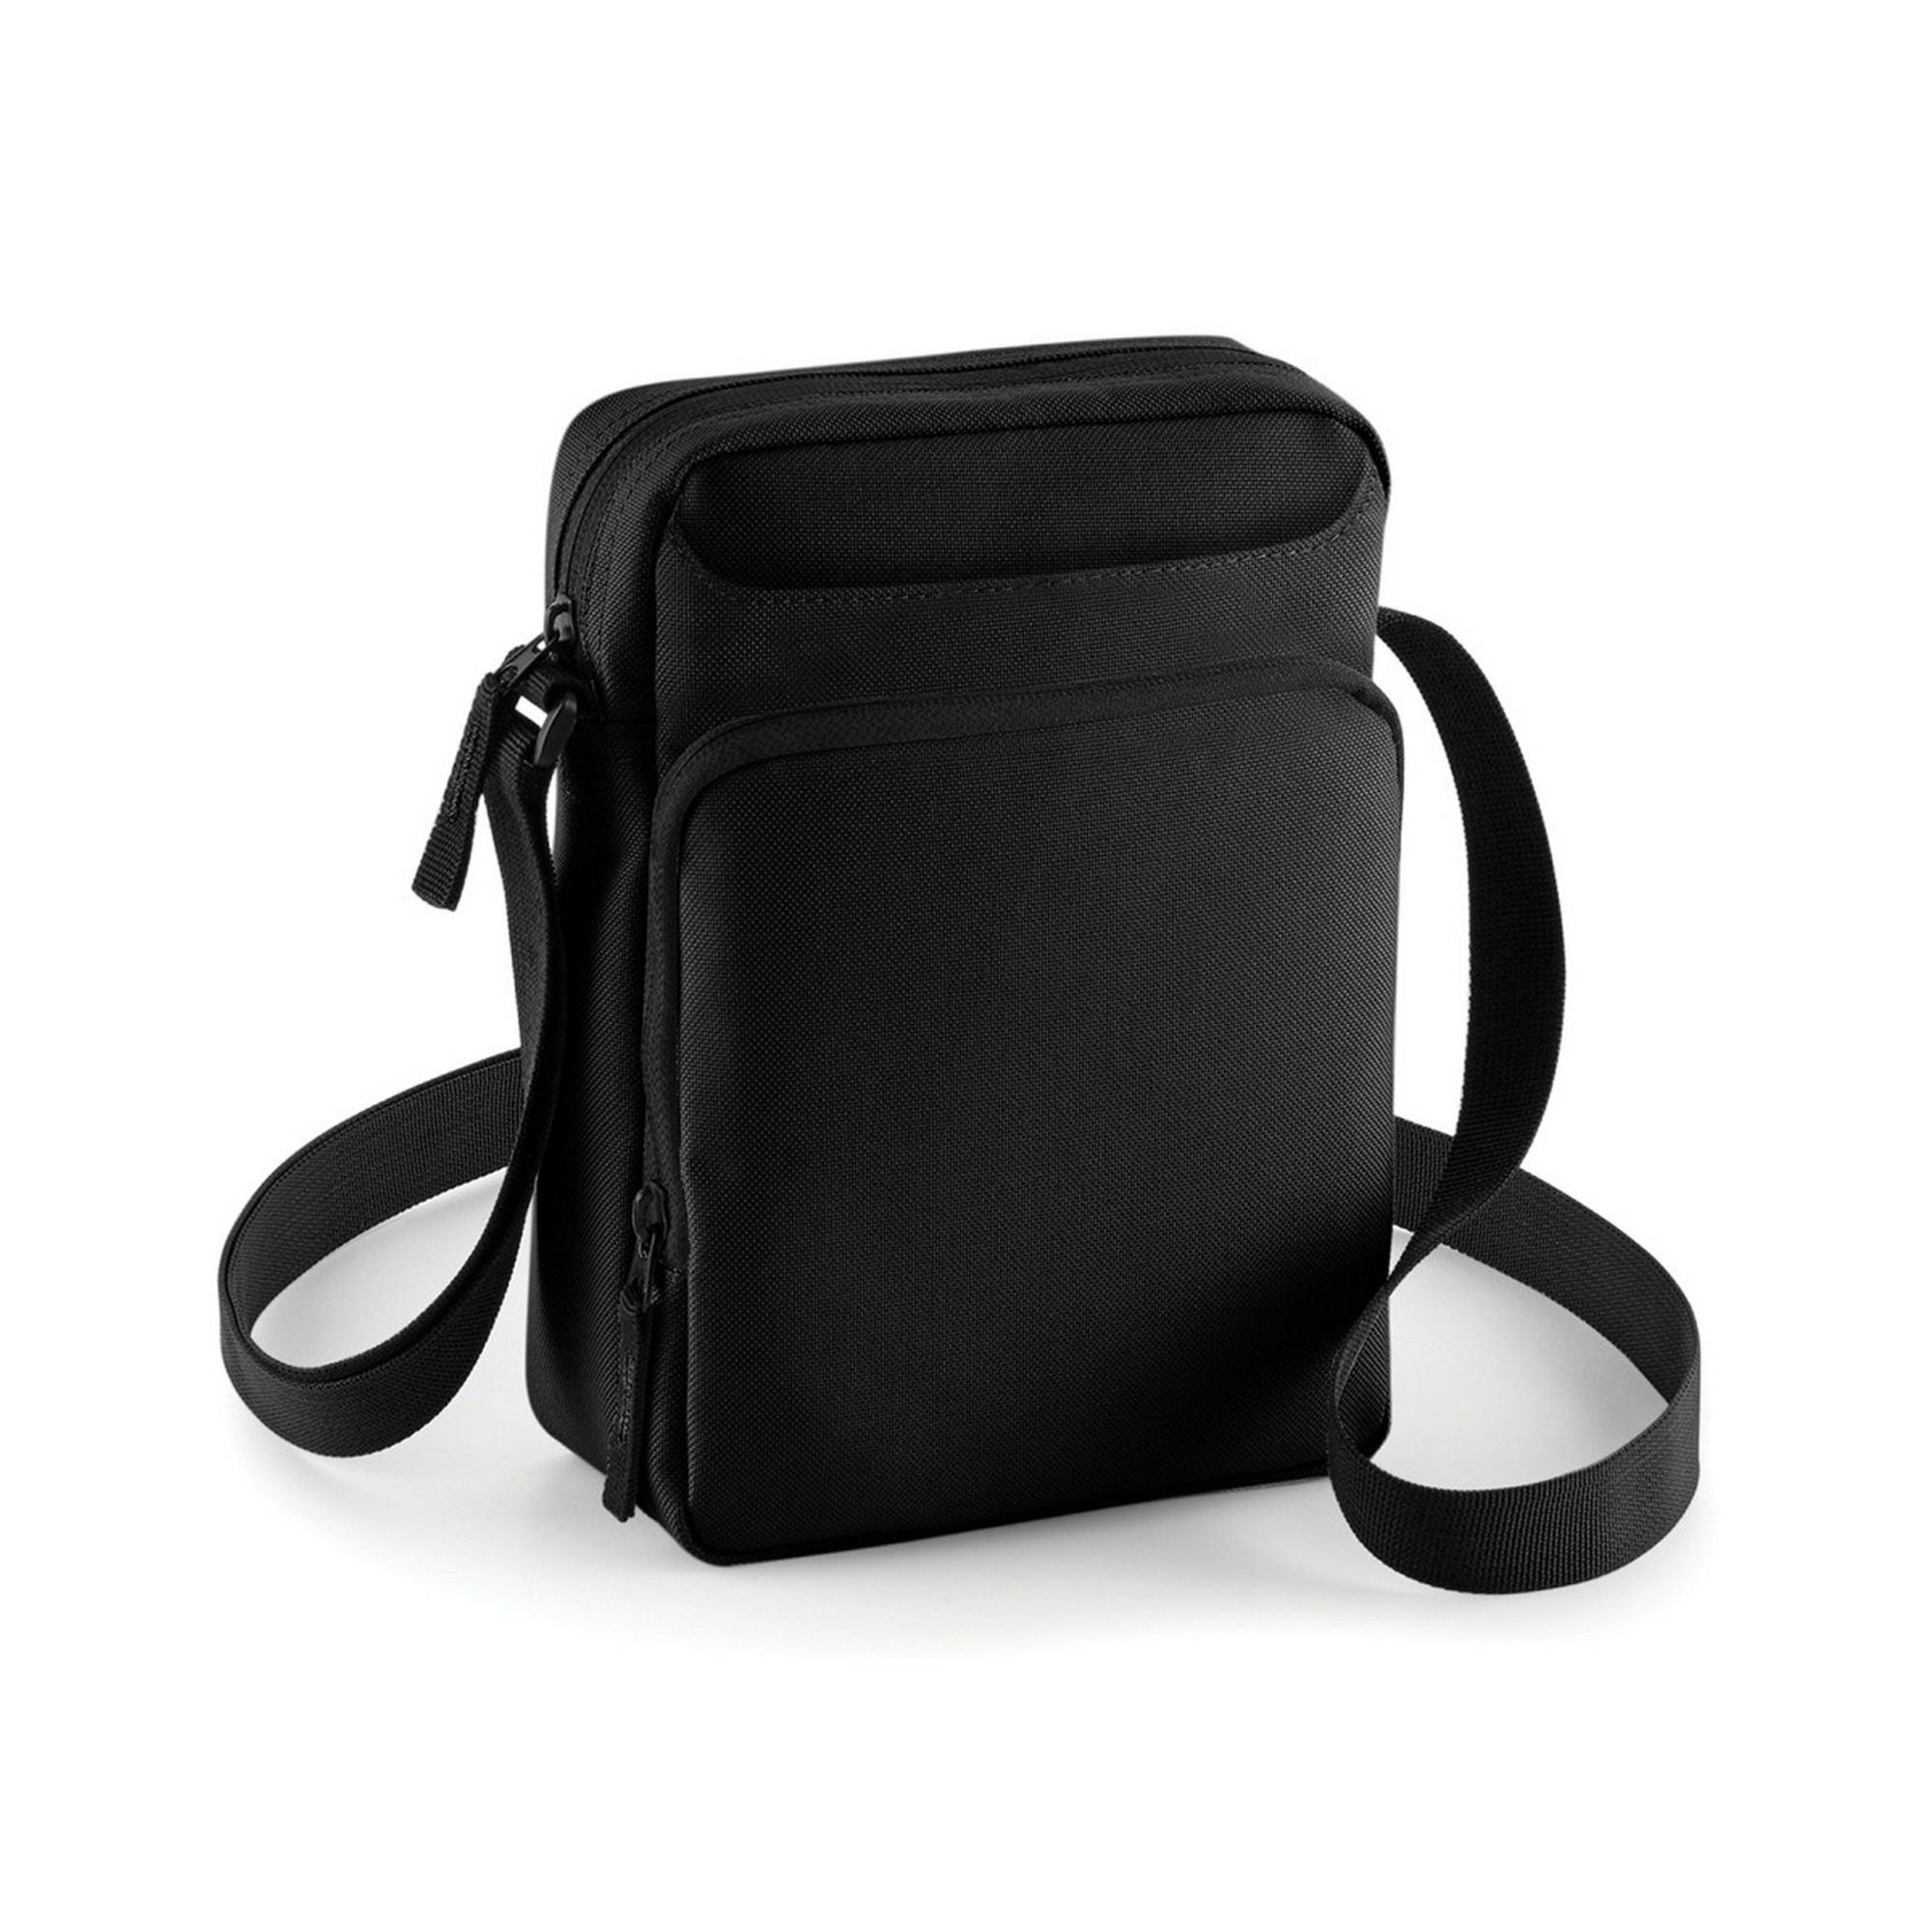 Bagbase Across Shoulder Strap Cross Body Bag (One Size) (Black)